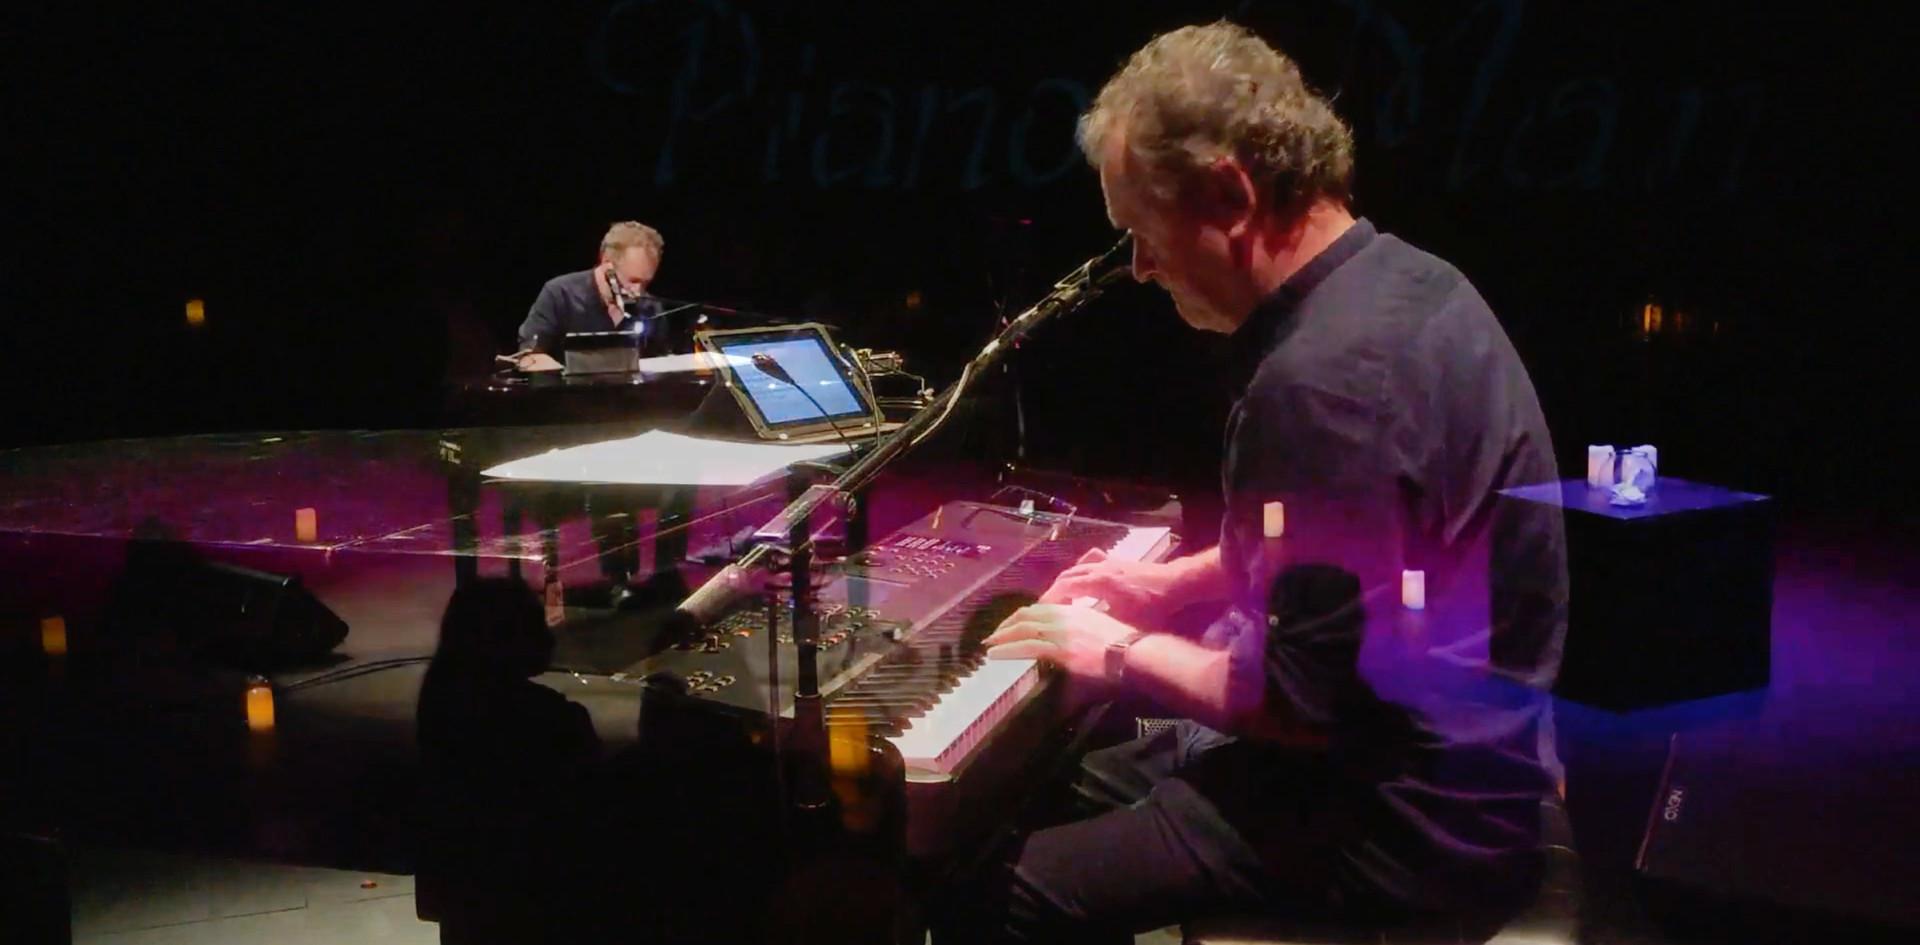 John Forde - Piano Man